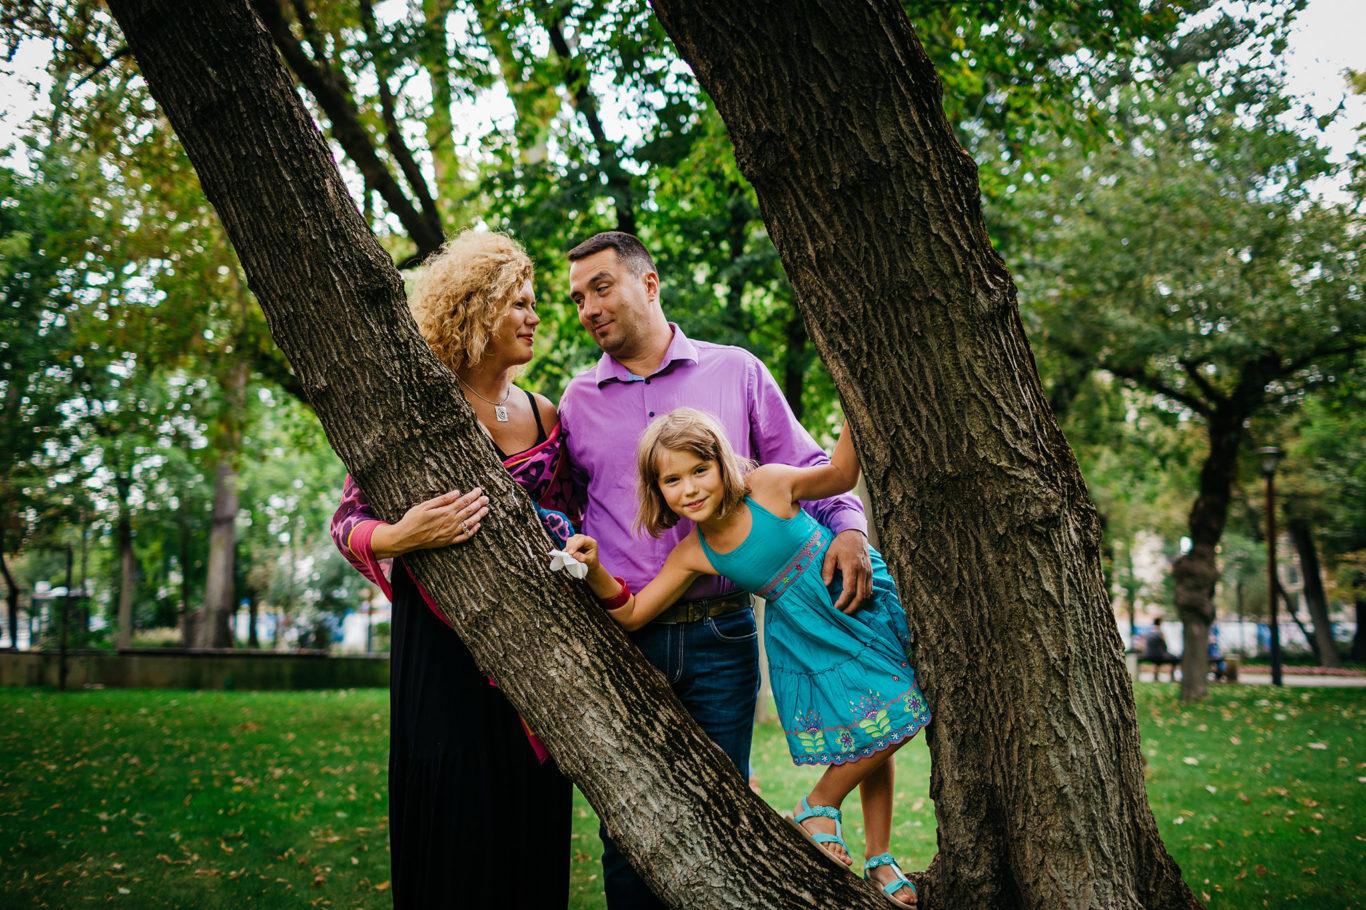 0154-fotografii-familie-ioana-alex-maia-roxi-fotograf-ciprian-dumitrescu-cd2_2130